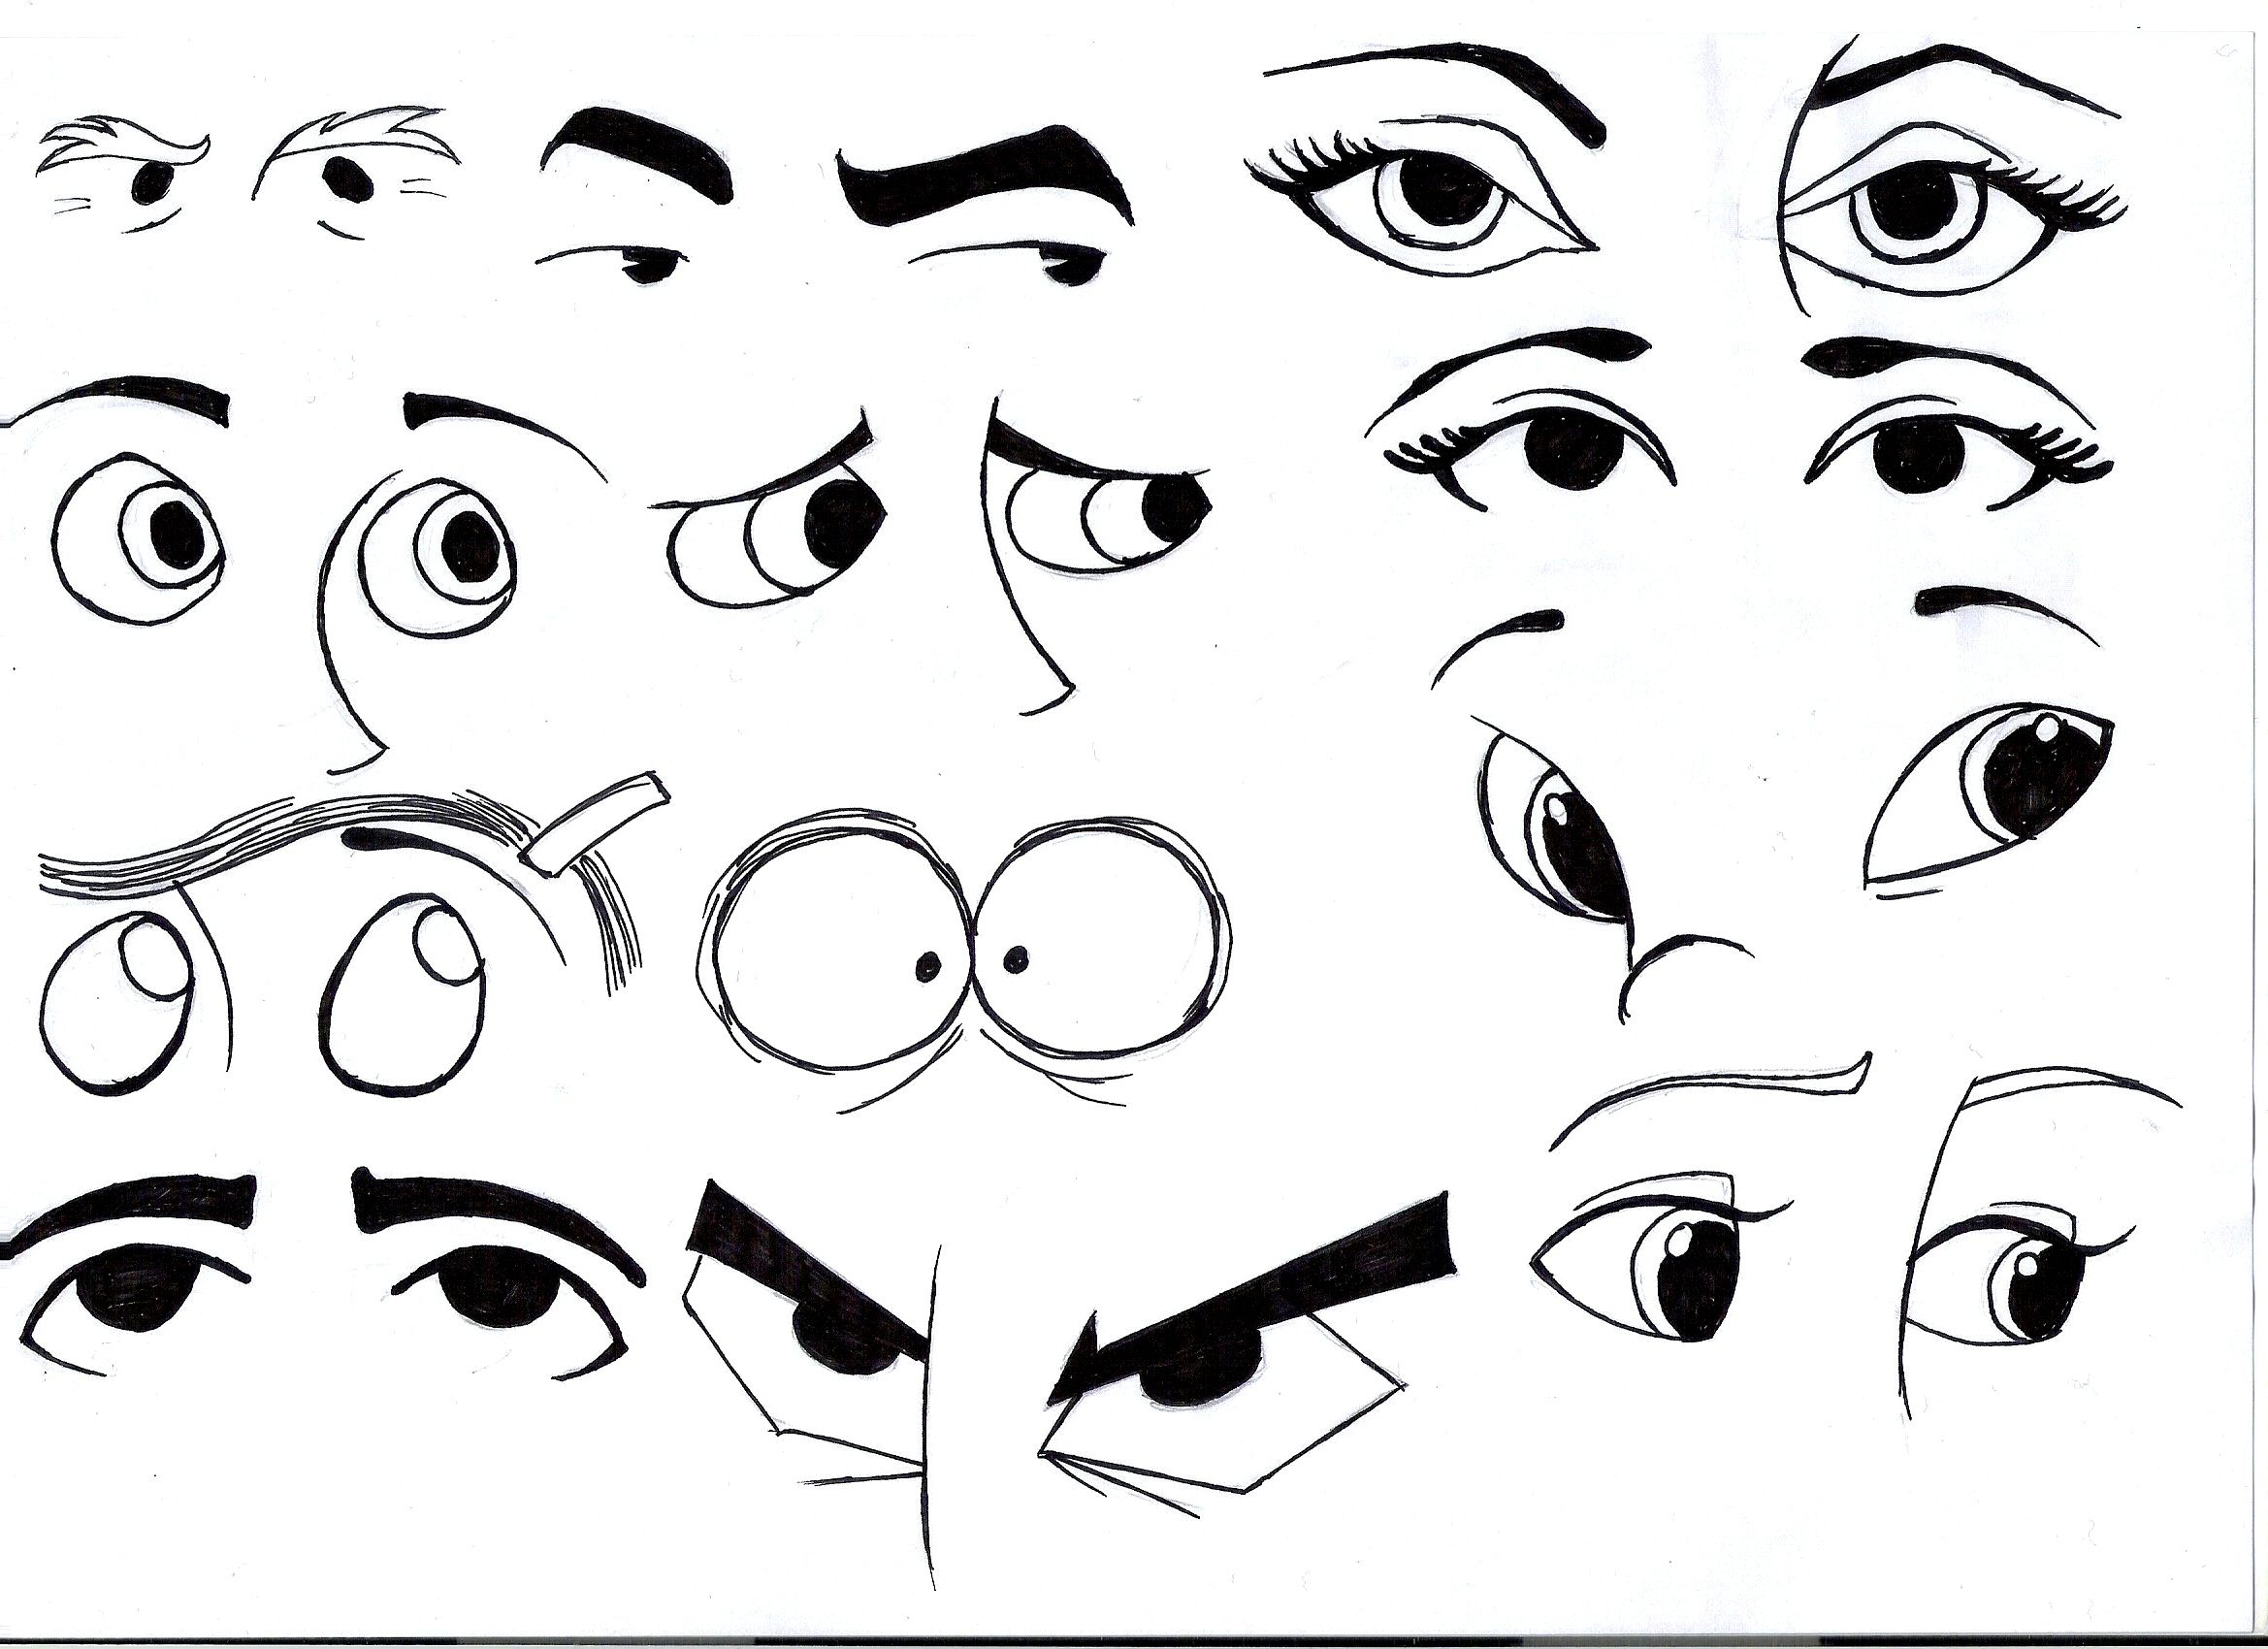 The Importance Of Eyes With Images Cartoon Eyes Cartoon Eyes